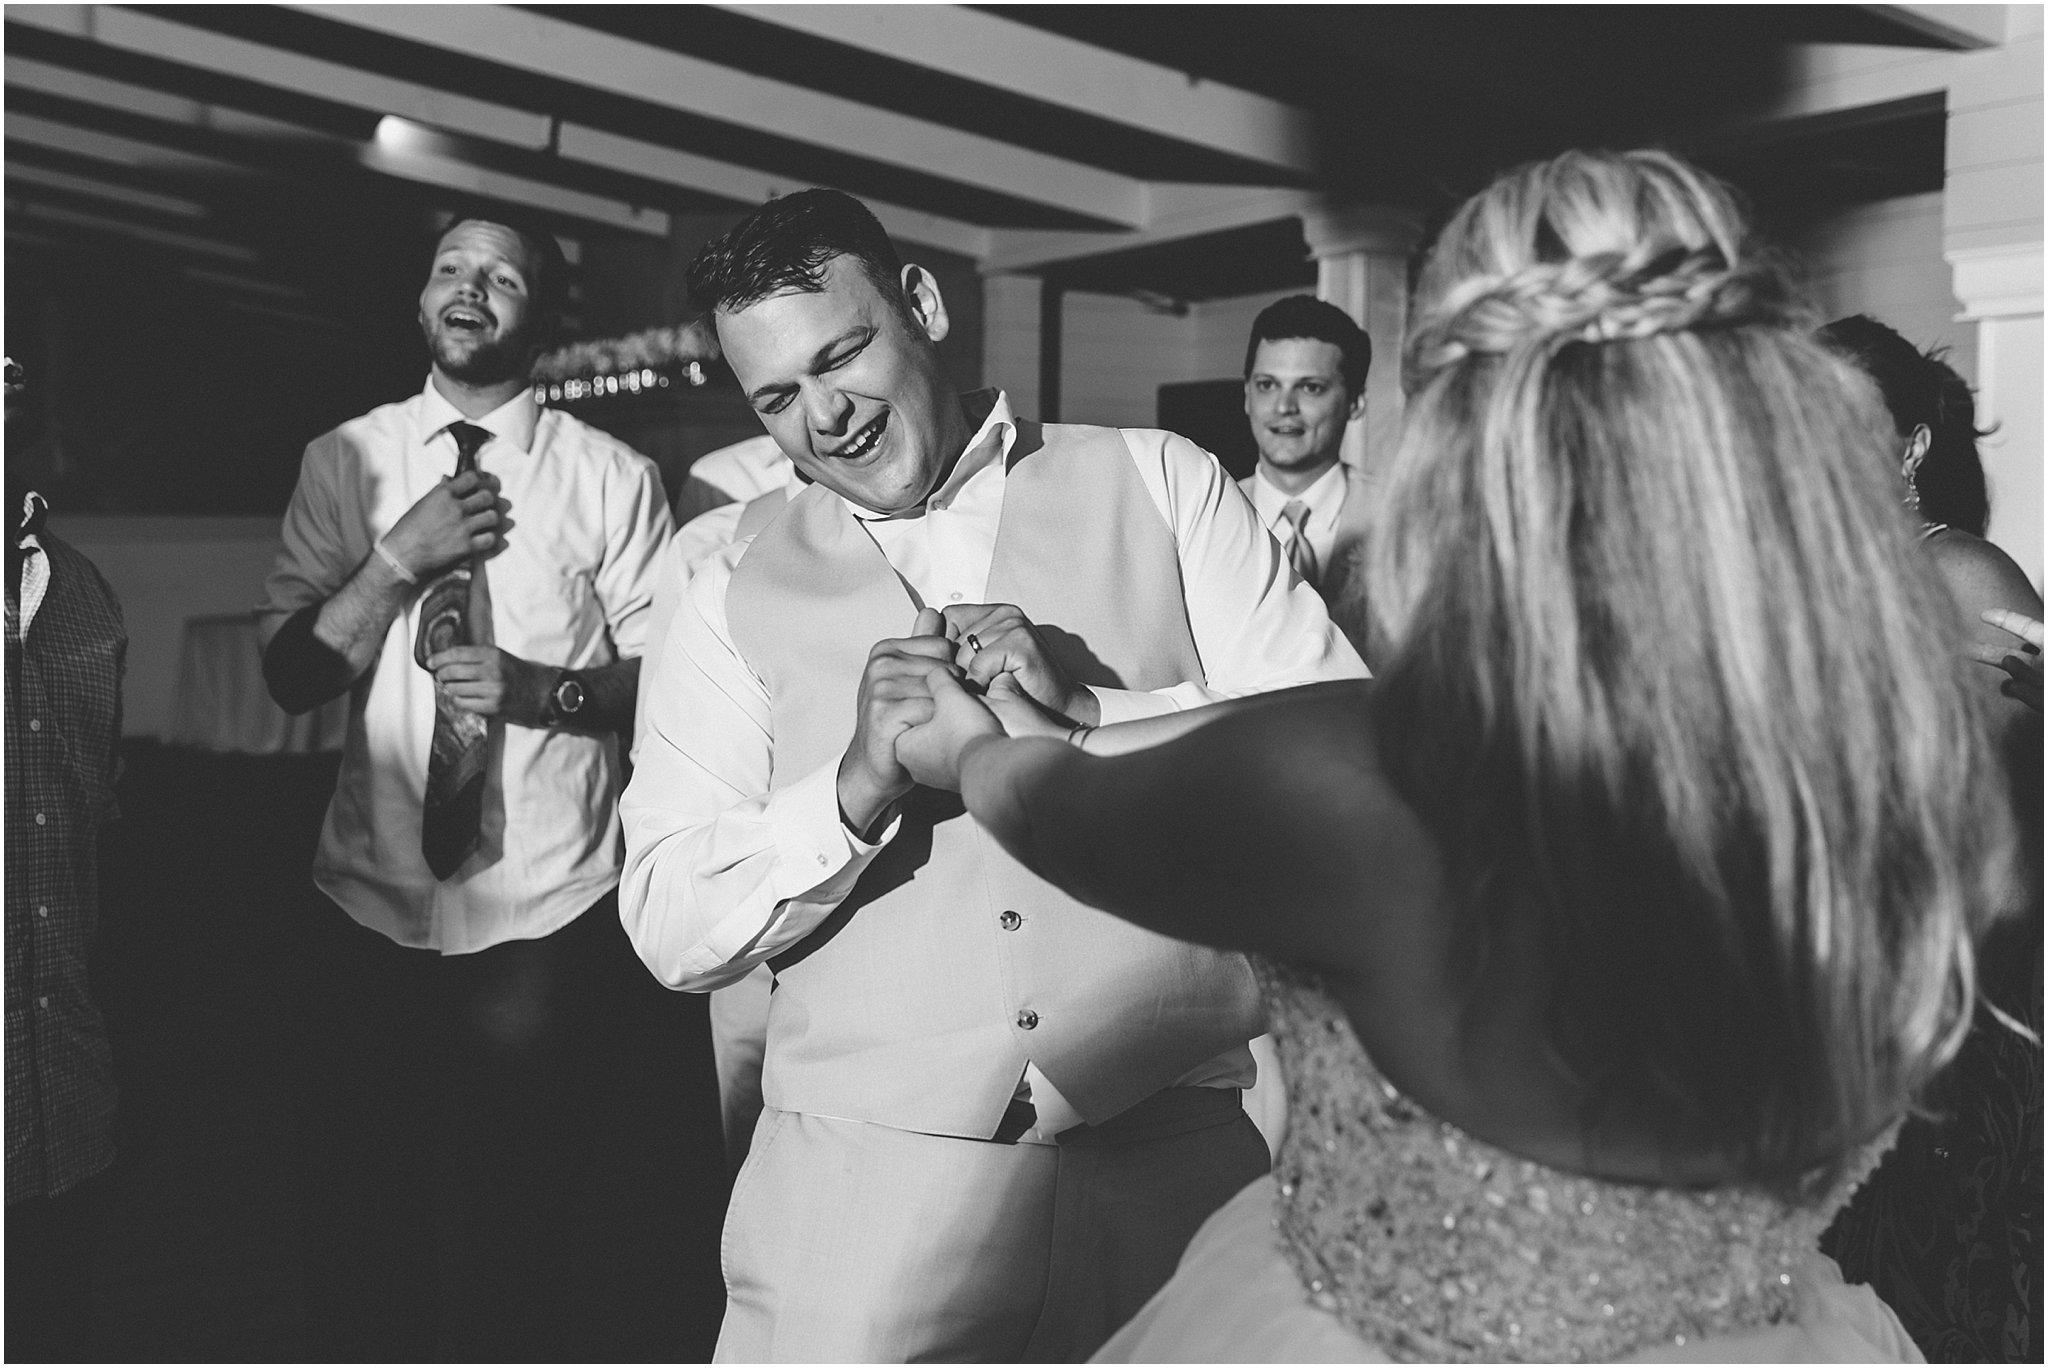 jessica_ryan_photography_wedding_hampton_roads_virginia_virginia_beach_weddings_0636